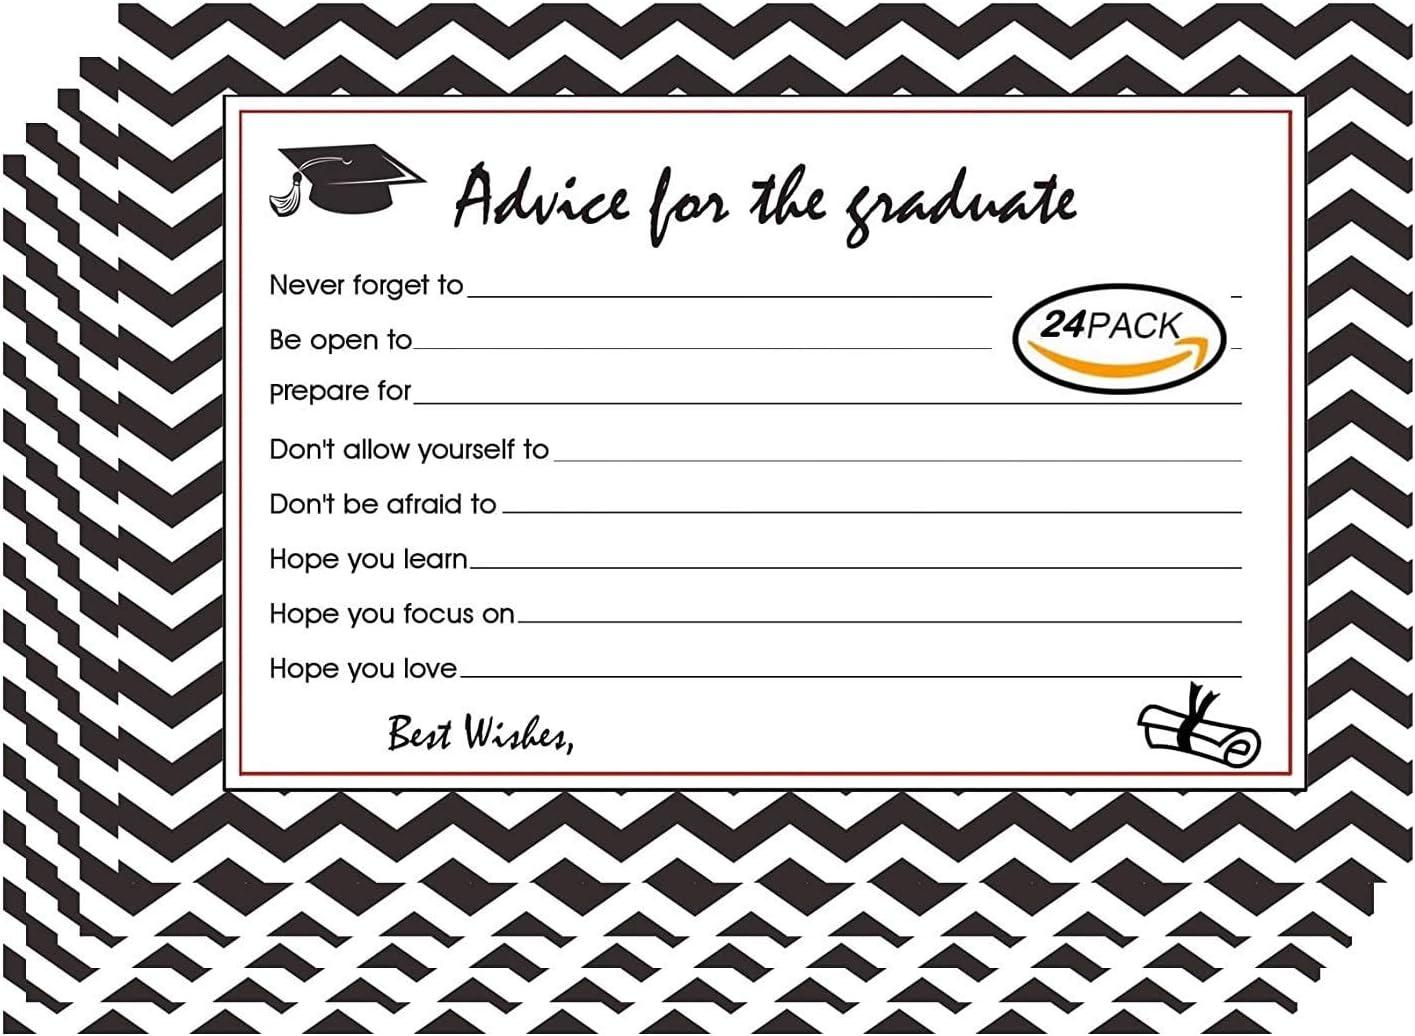 Graduation Advice Cards Assorted Graduation Cards 2019 Grad Party Decor 24 Packs